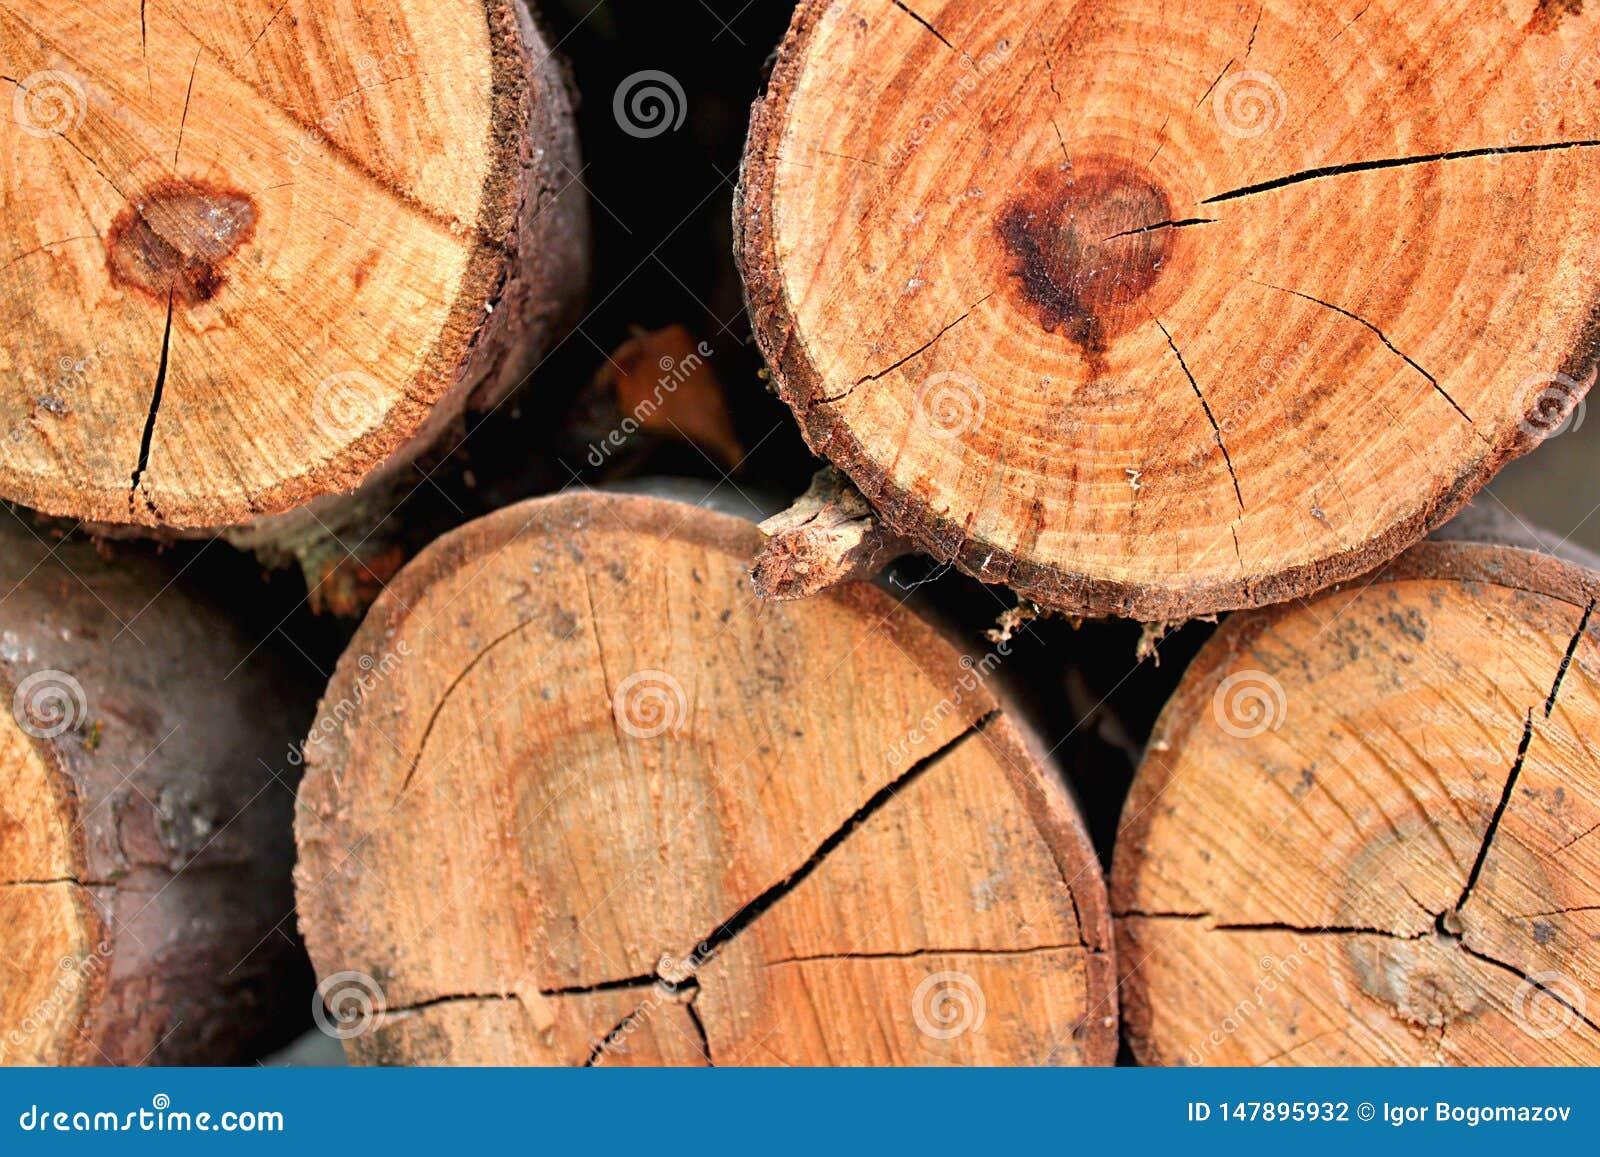 Tekstura suchy drewno dla graby